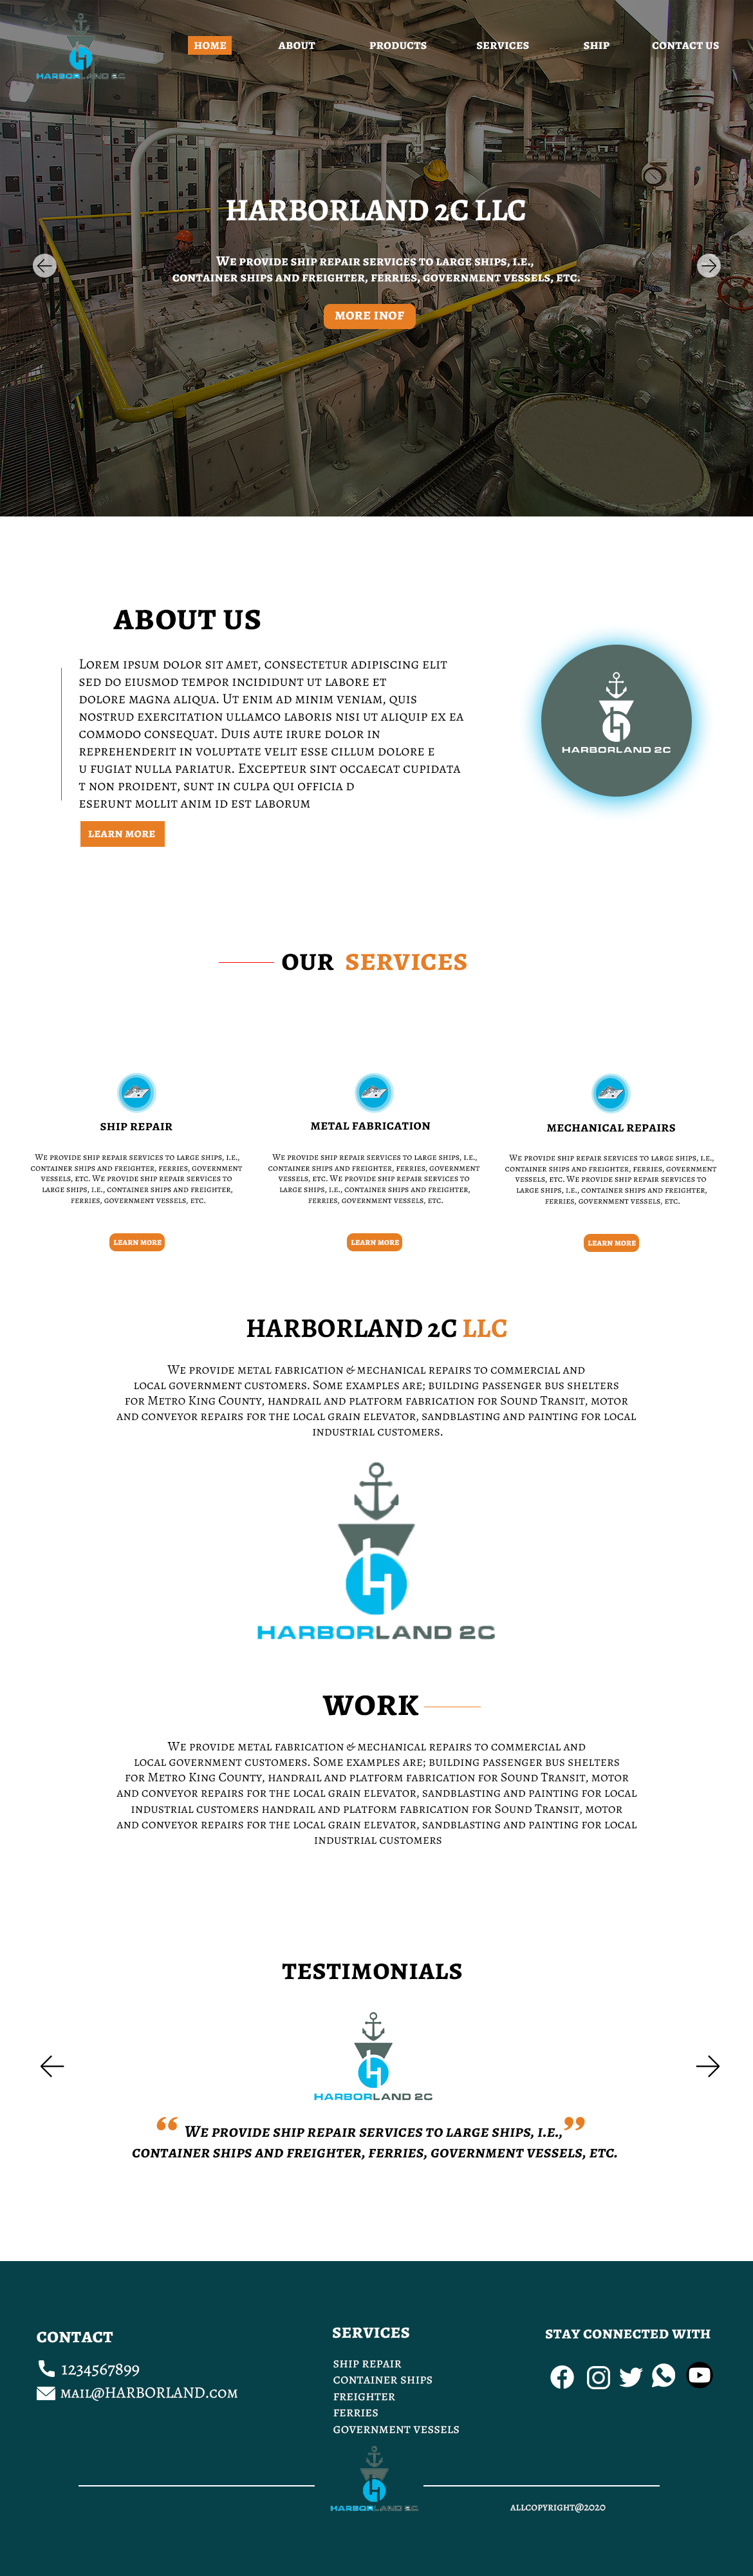 HARBOR LAND 2C LLC,